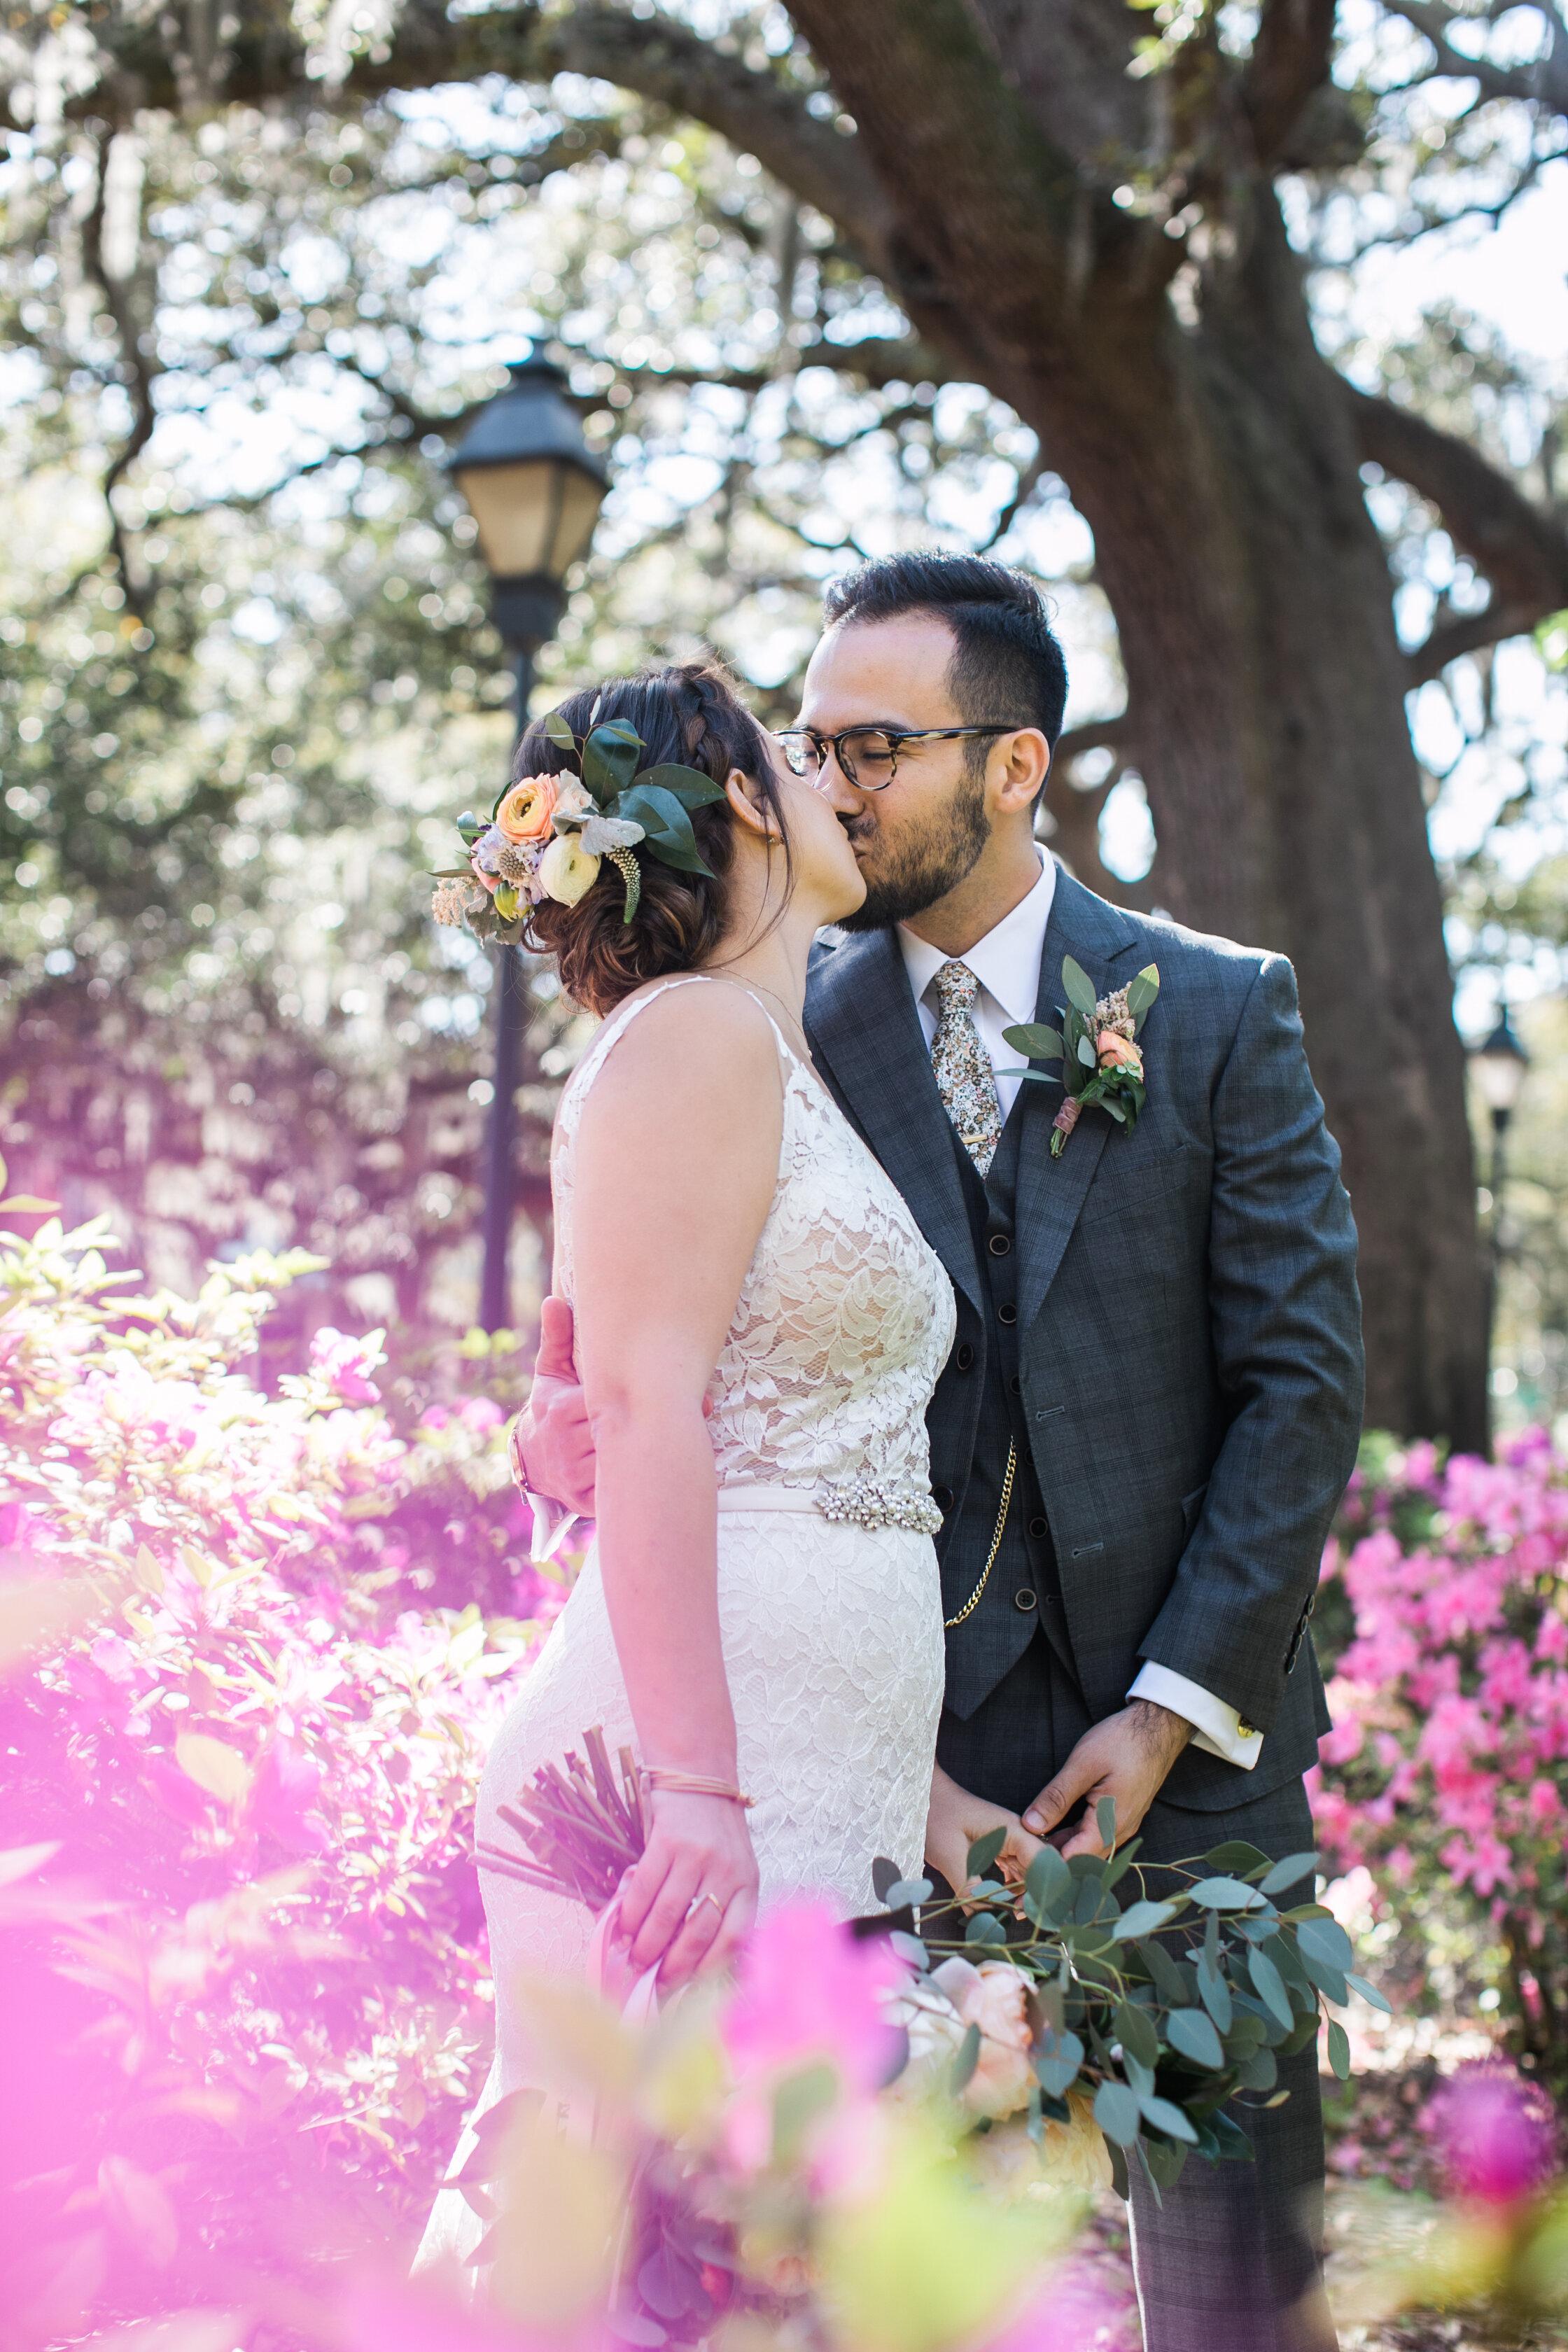 ivory-and-beau-blog-weddings-ivory-and-beau-couple-dominique-and-andres-savannah-florist-wedding-planning-savannah-bridal-boutique-wedding-flowers-KIP_WEBERWEDDING_RAILROADMUSEUM-721.JPG